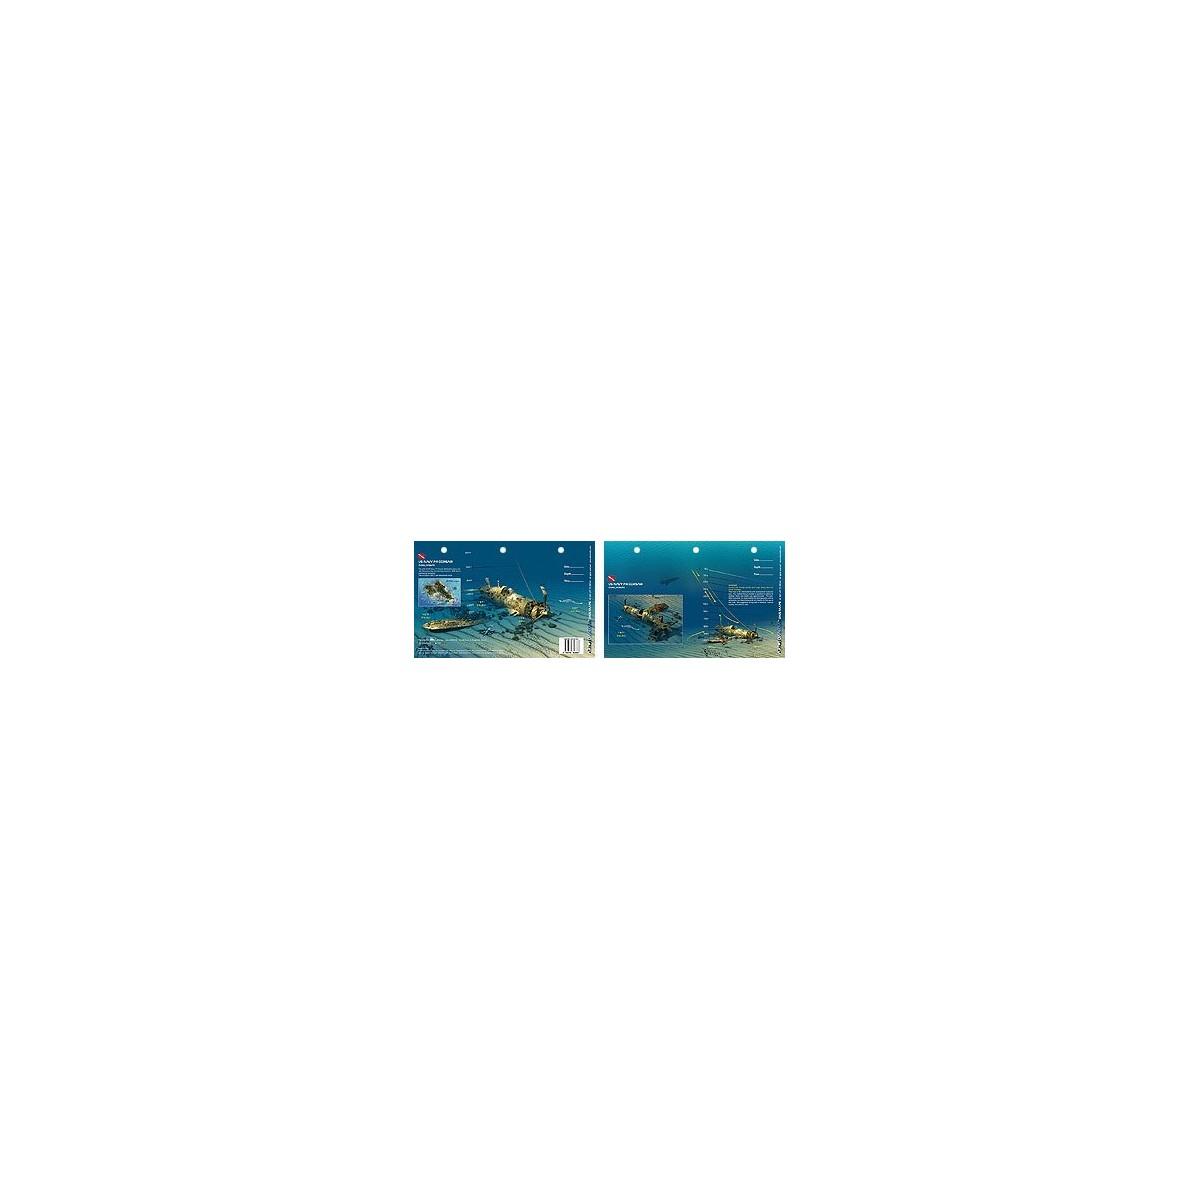 Corsair in Oahu, Hawaii (8.5 x 5.5 Inches) (21.6 x 15cm) - New Art to Media Underwater Waterproof 3D Dive Site Map